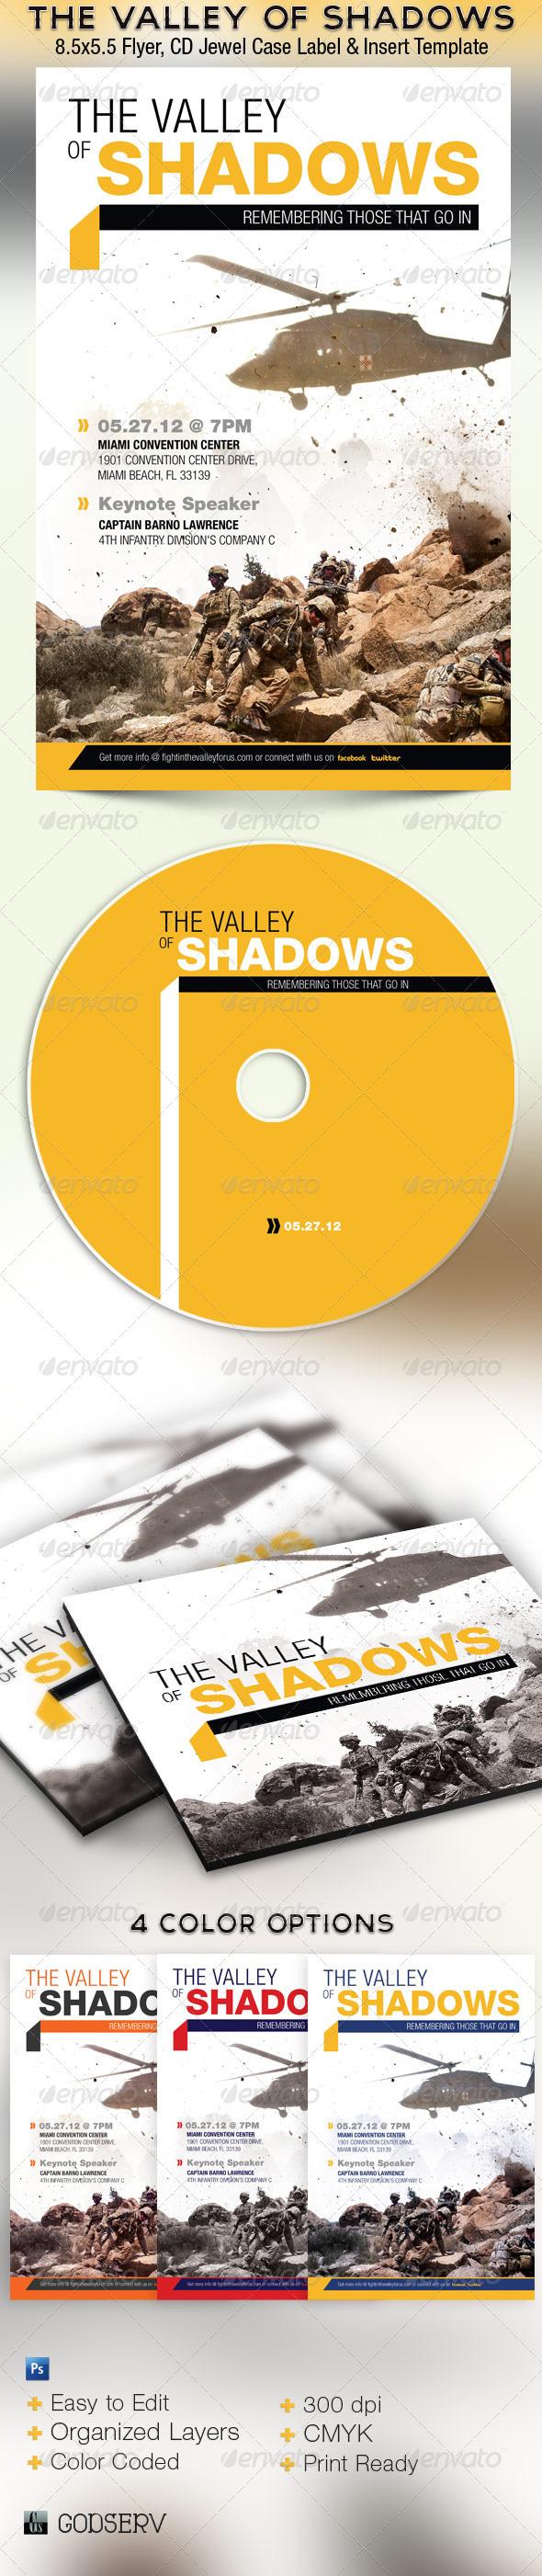 Valley Shadows Flyer CD Template - Church Flyers